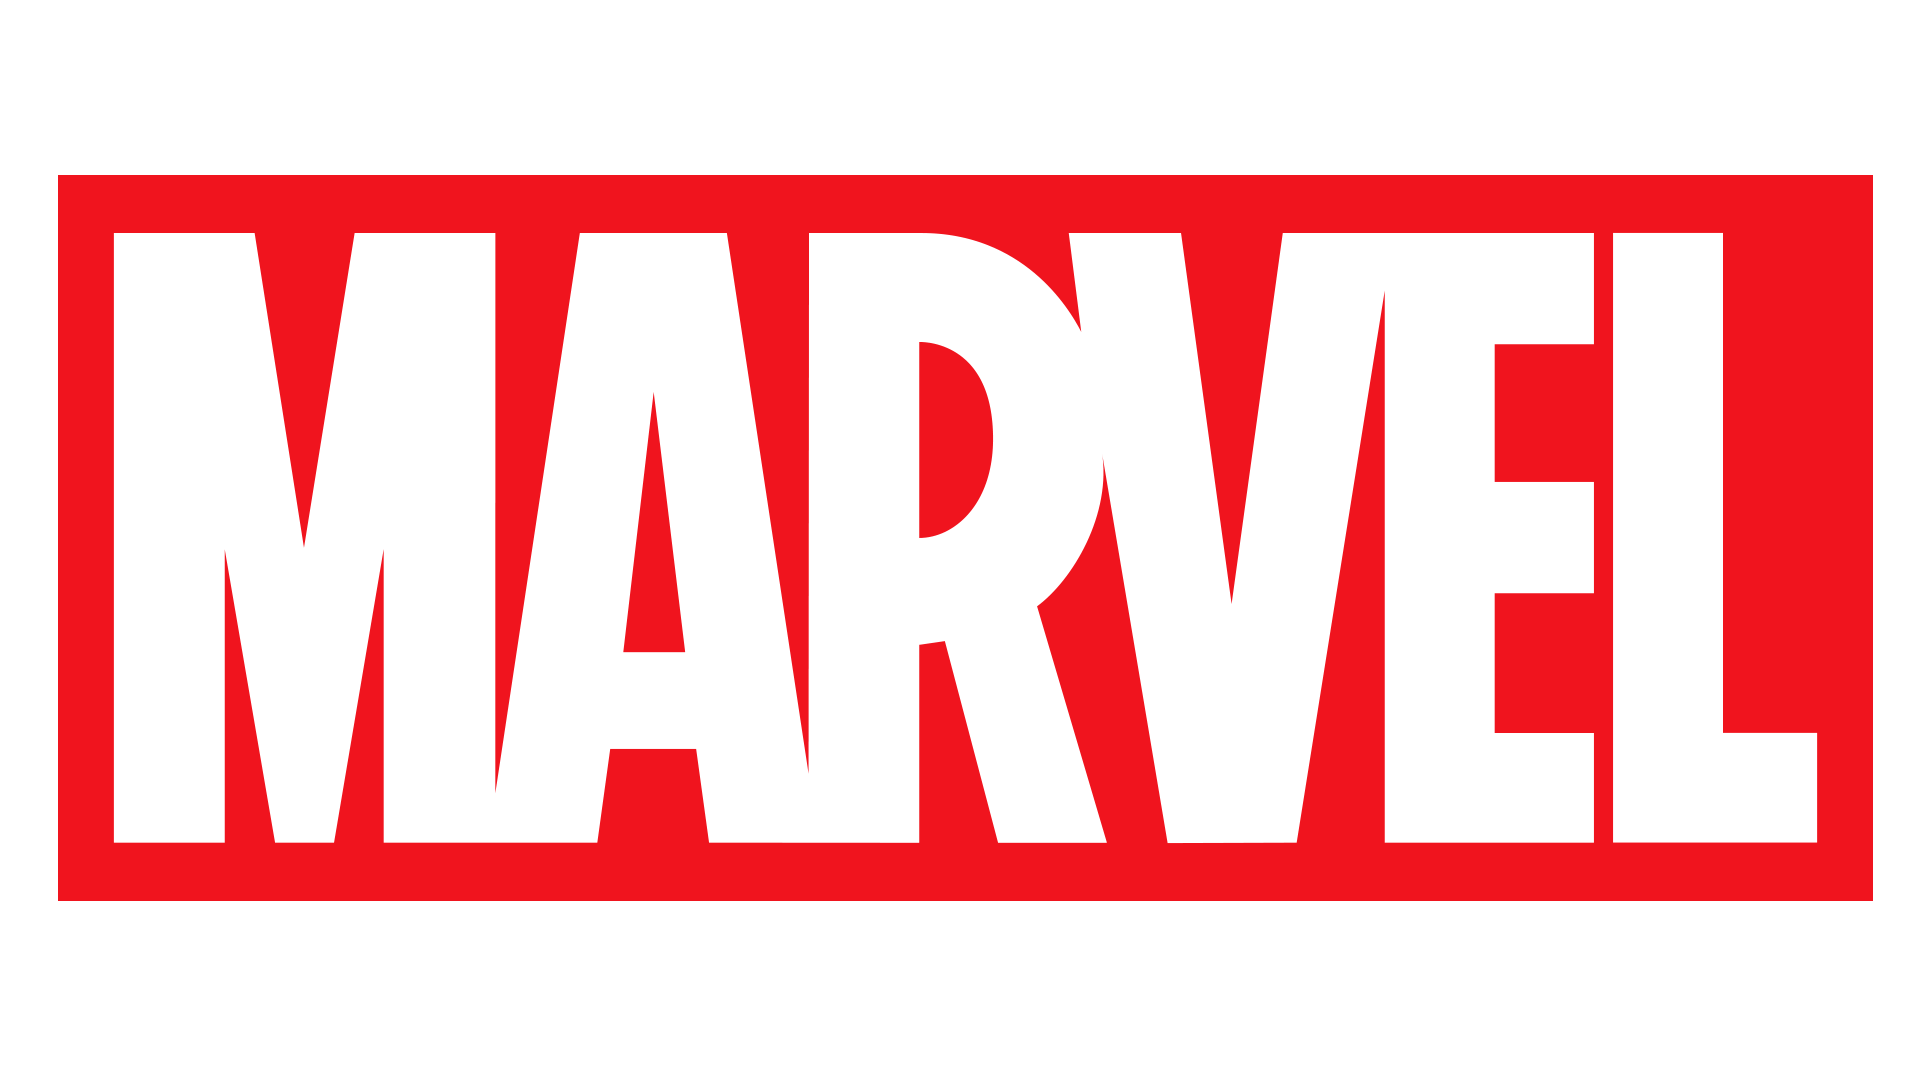 Marvel logo histoire et signification, evolution, symbole ...